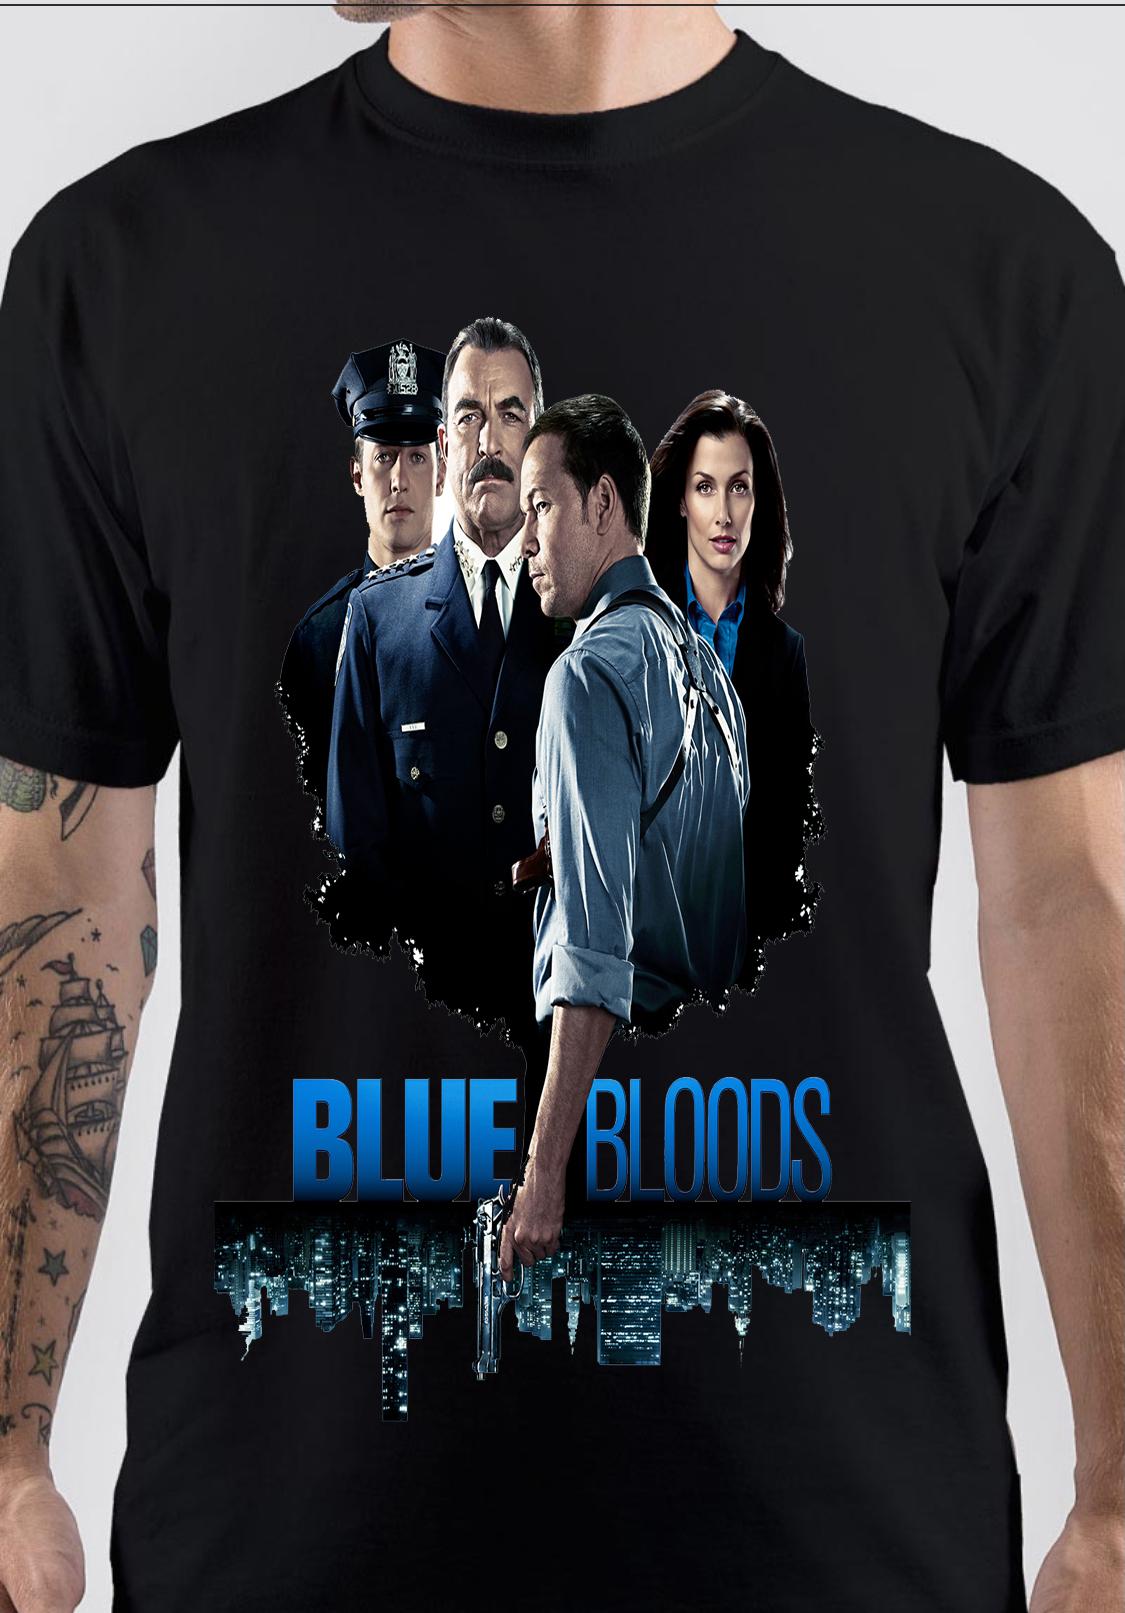 Blue Bloods T-Shirt And Merchandise